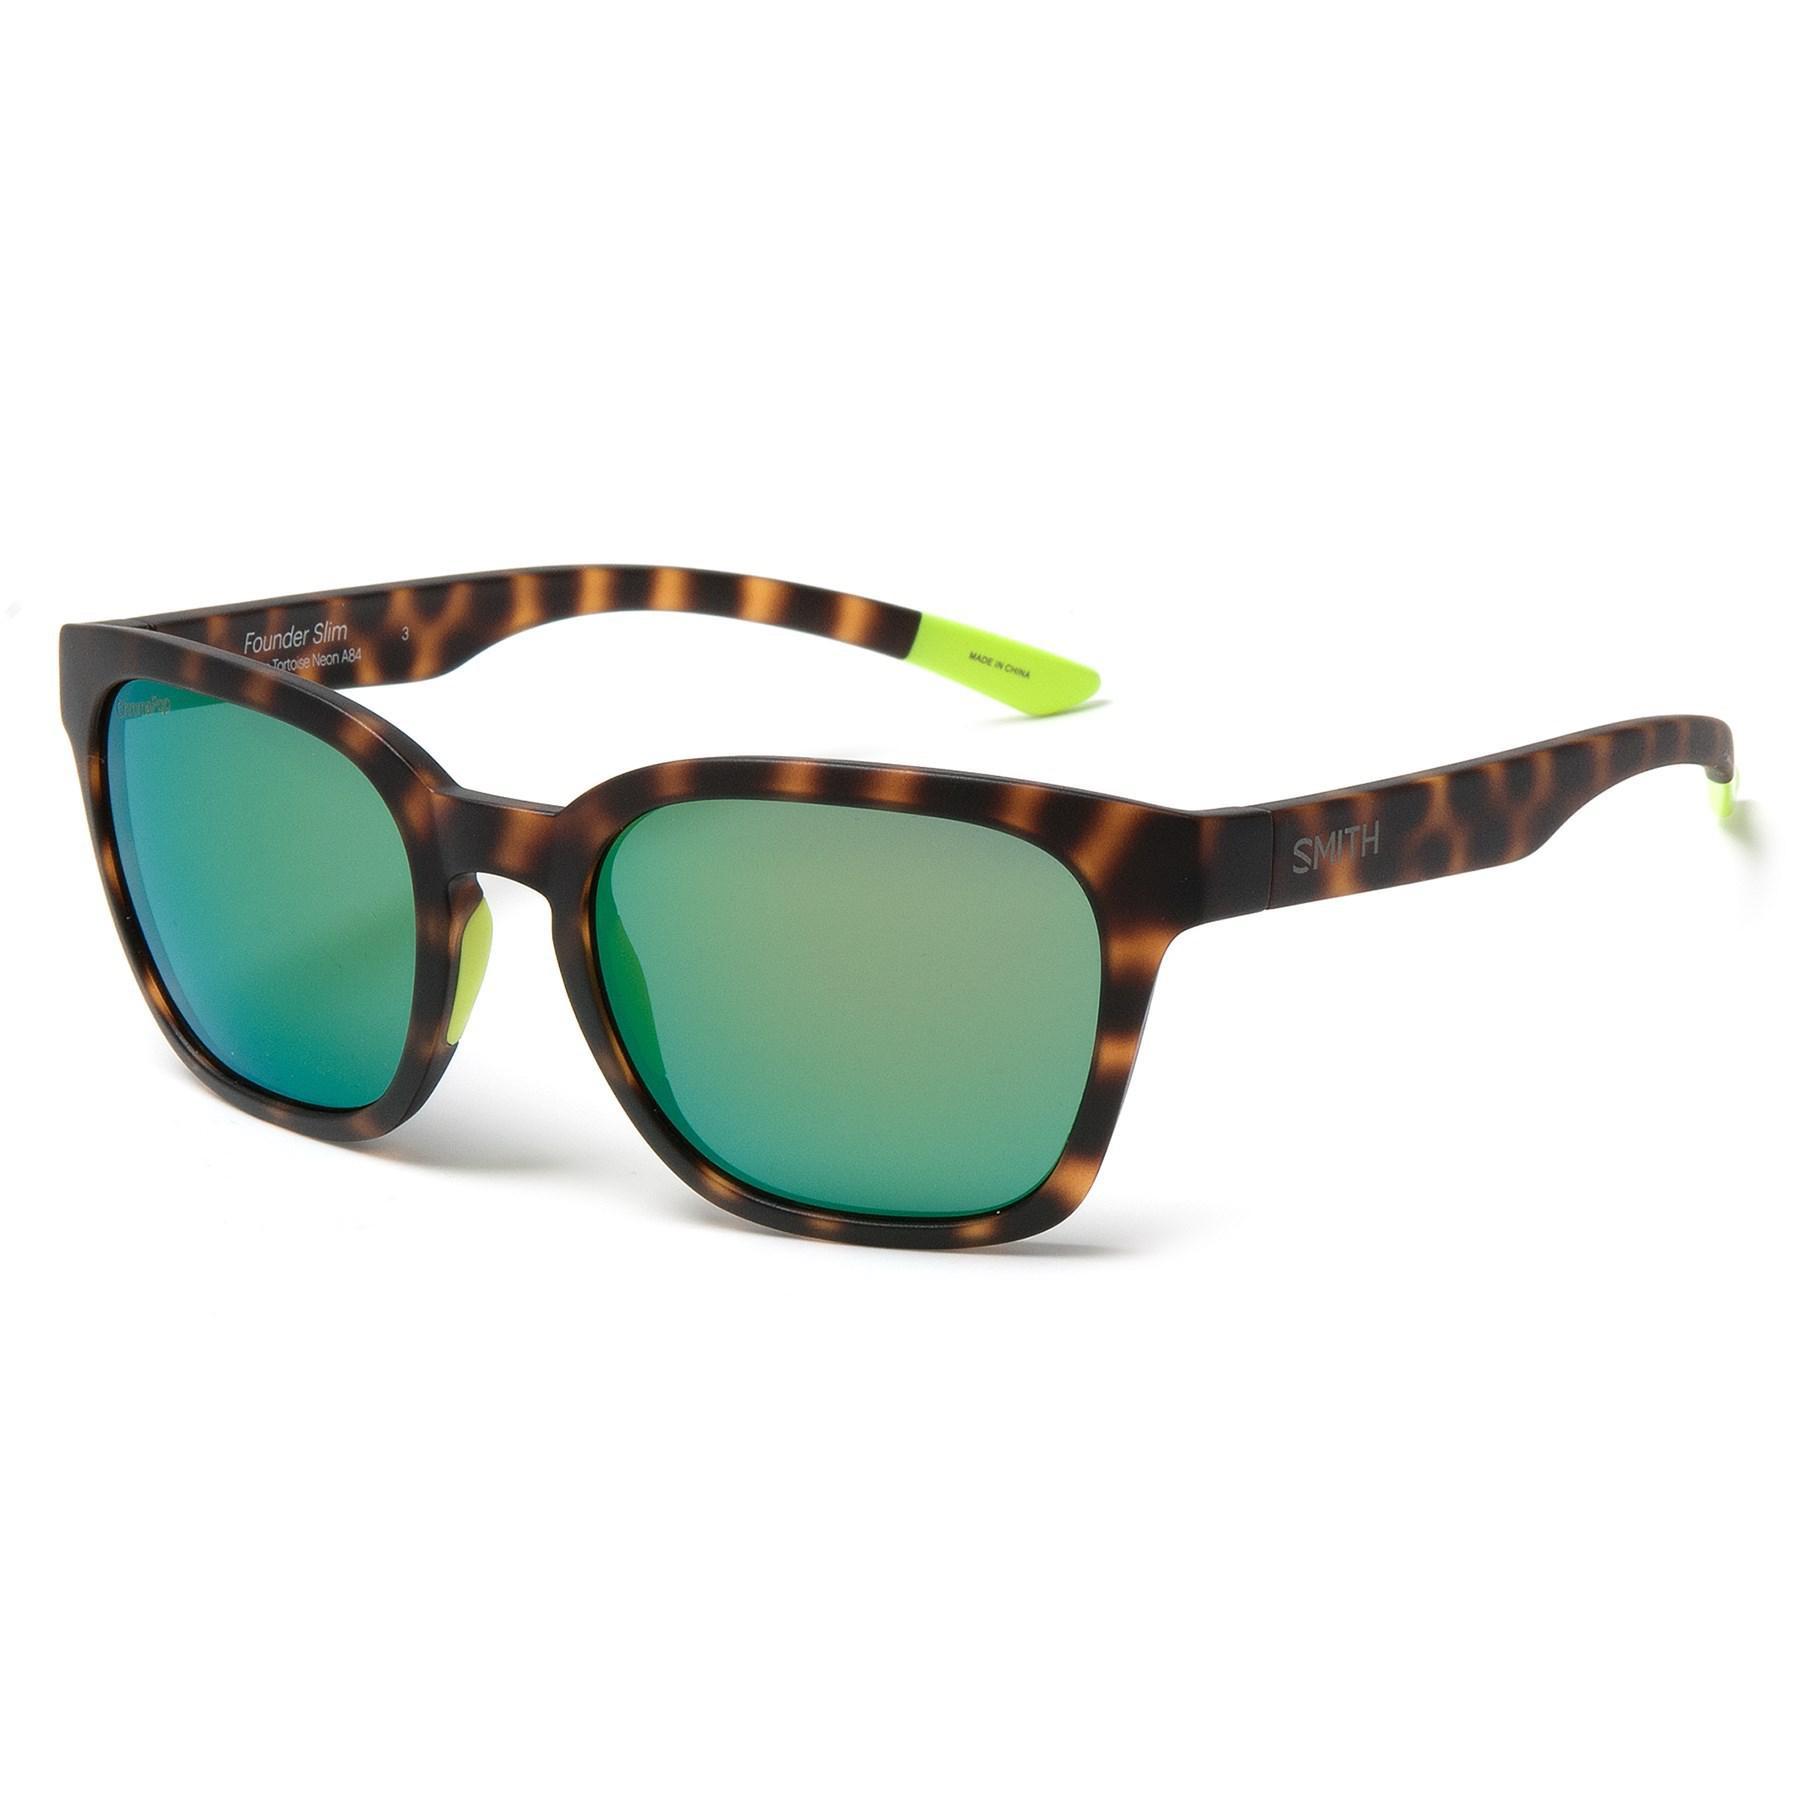 349f15aadaf81 Lyst - Smith Optics Founder Slim Sunglasses in Green for Men